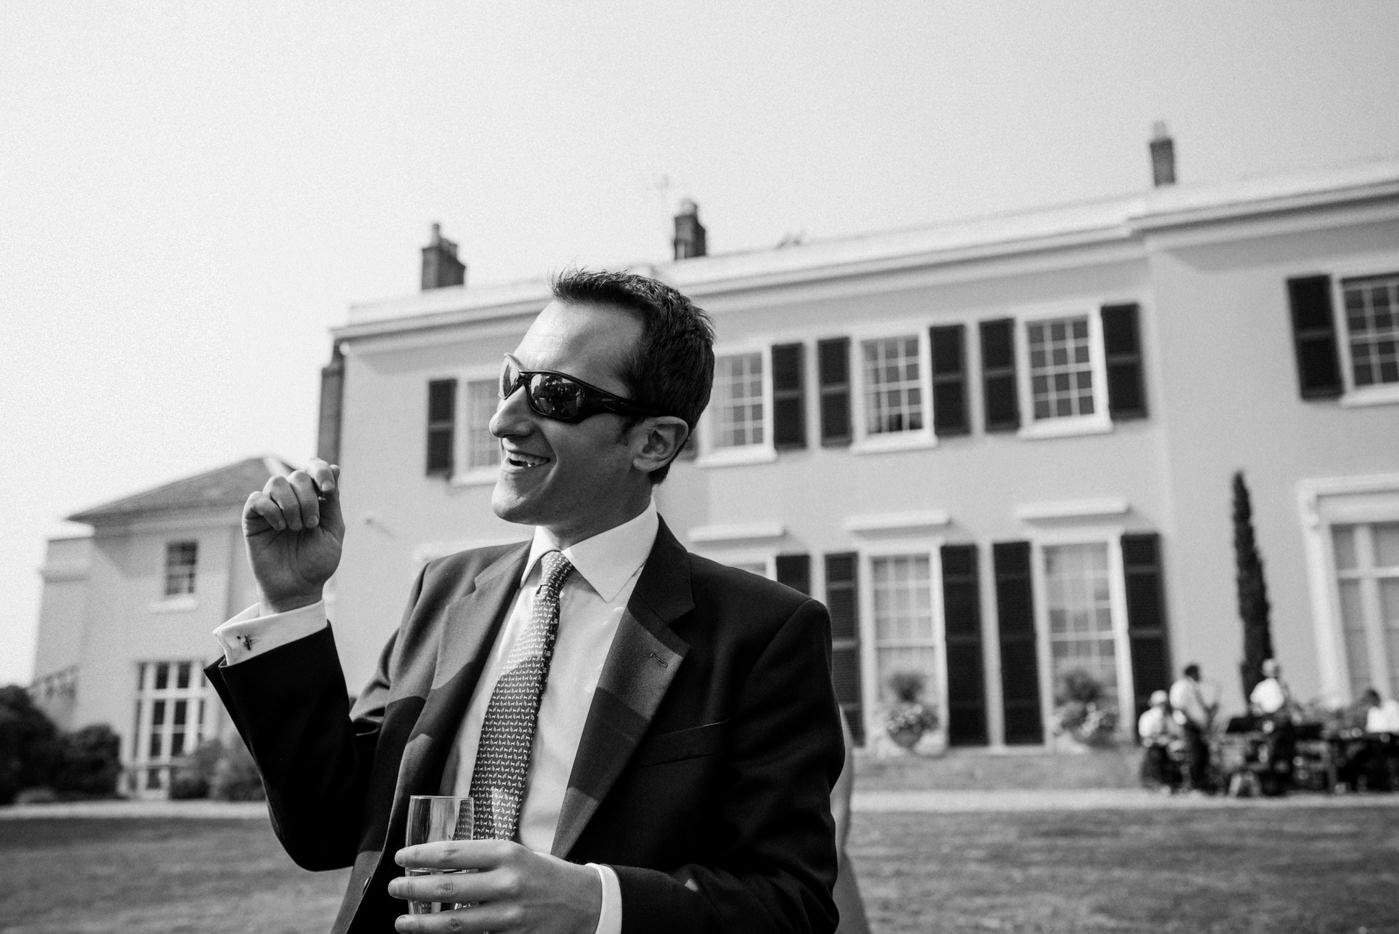 bignor-park-wedding-photography-robyn-and-tom-73